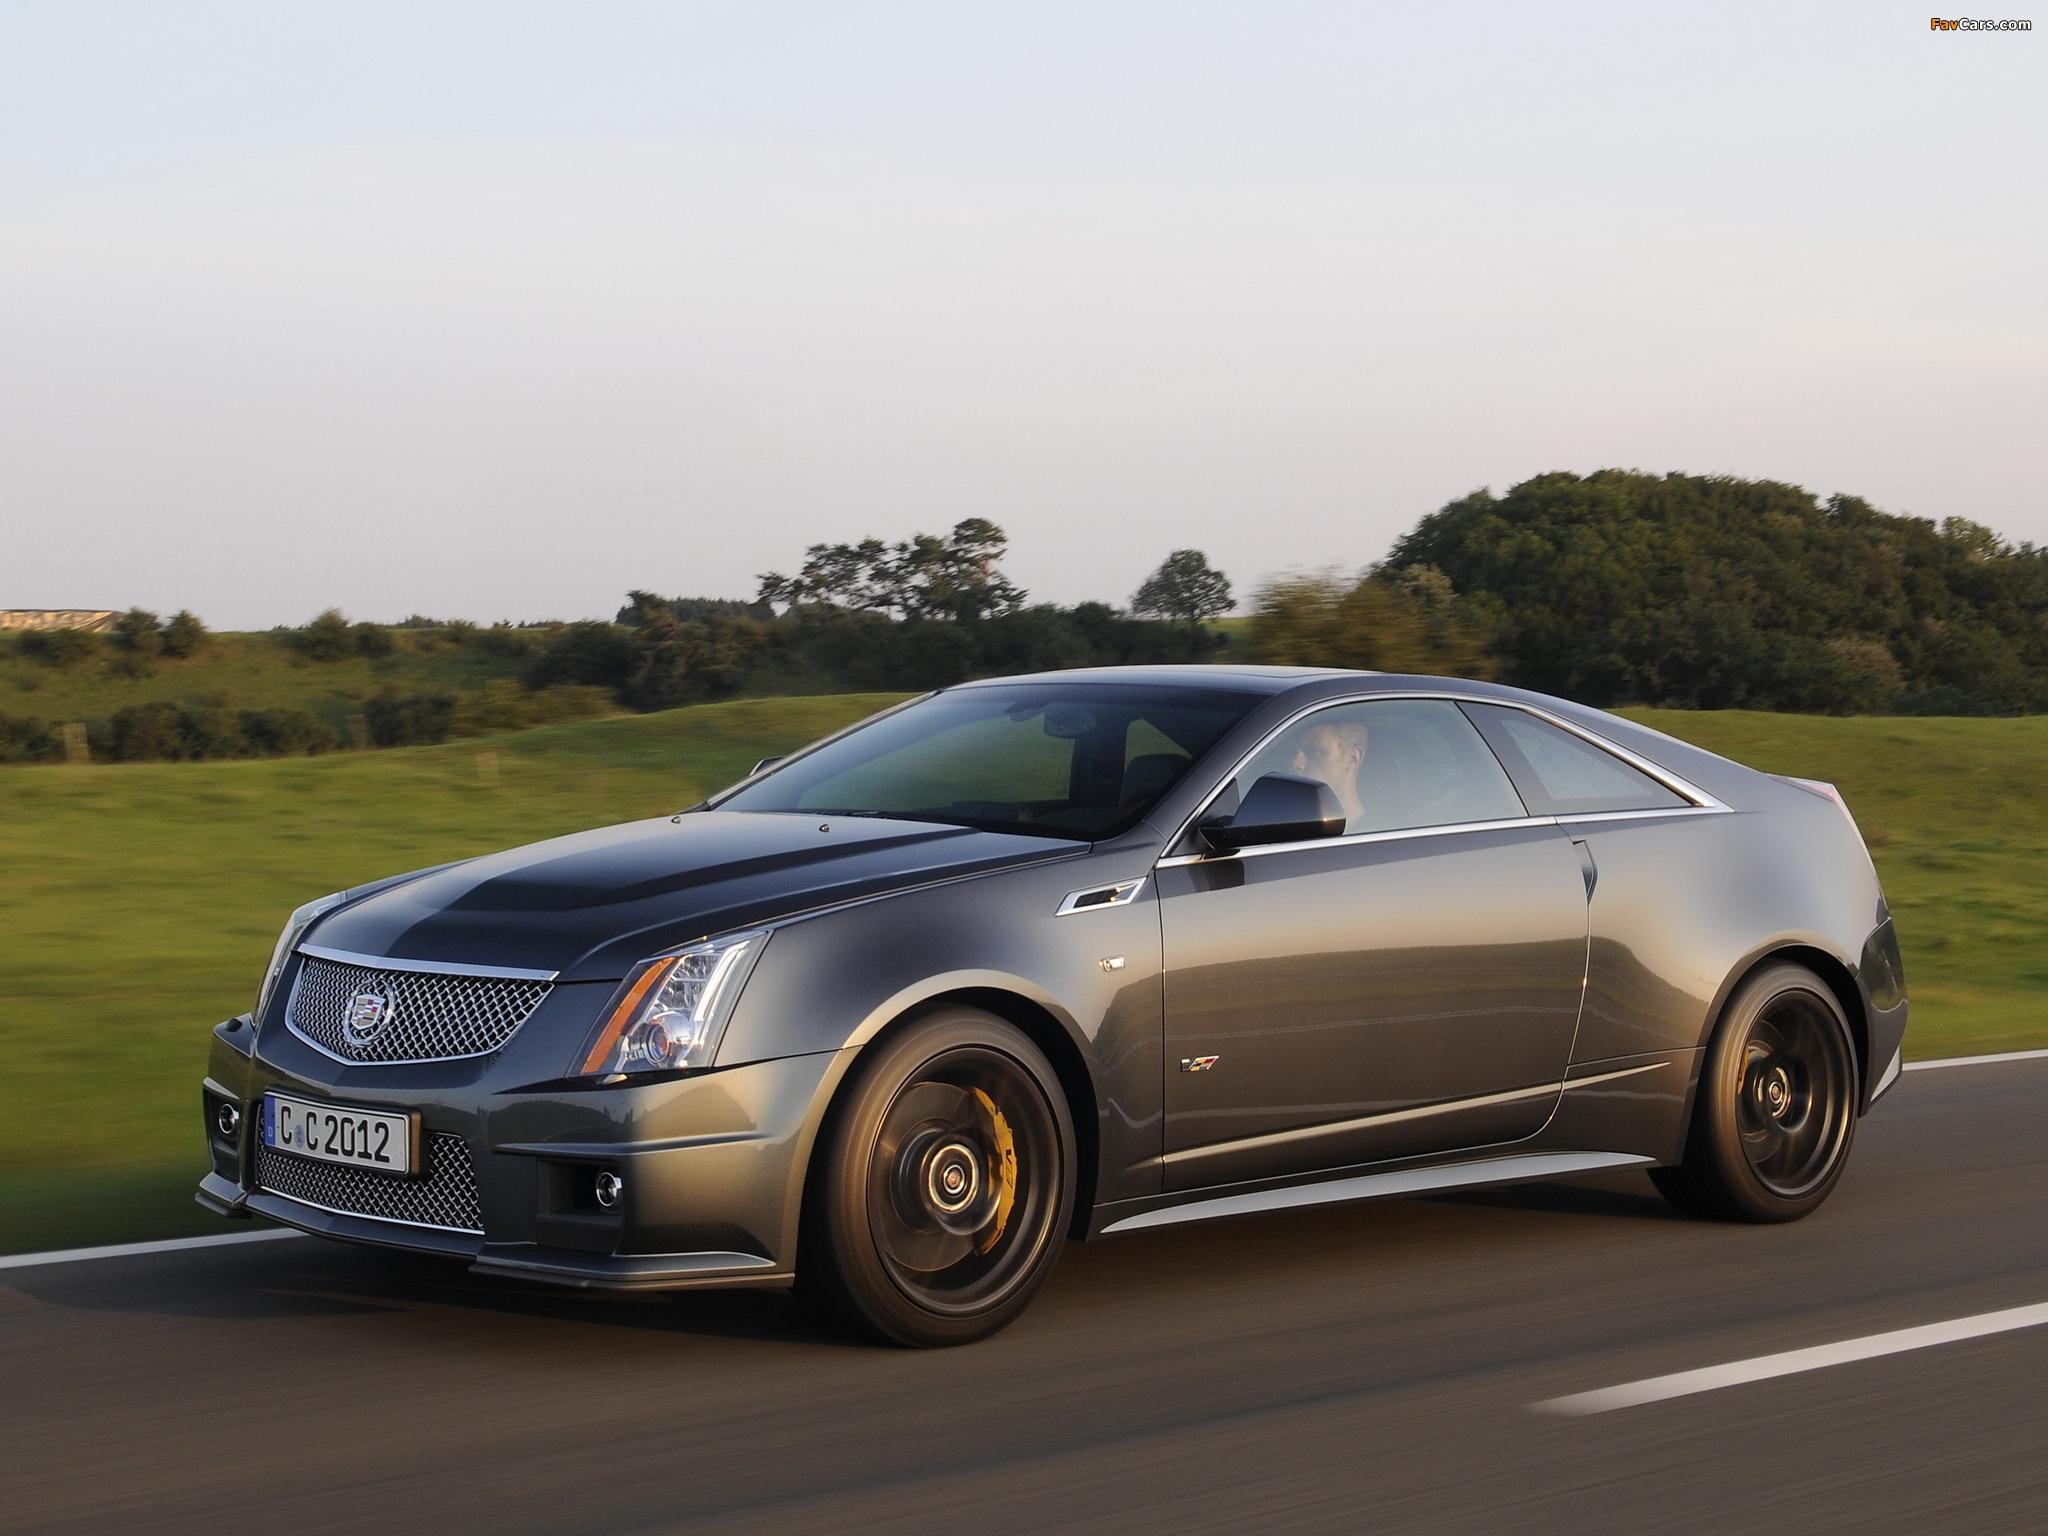 Cadillac CTS-V Coupe Black Diamond EU-spec 2011 pictures (2048 x 1536)